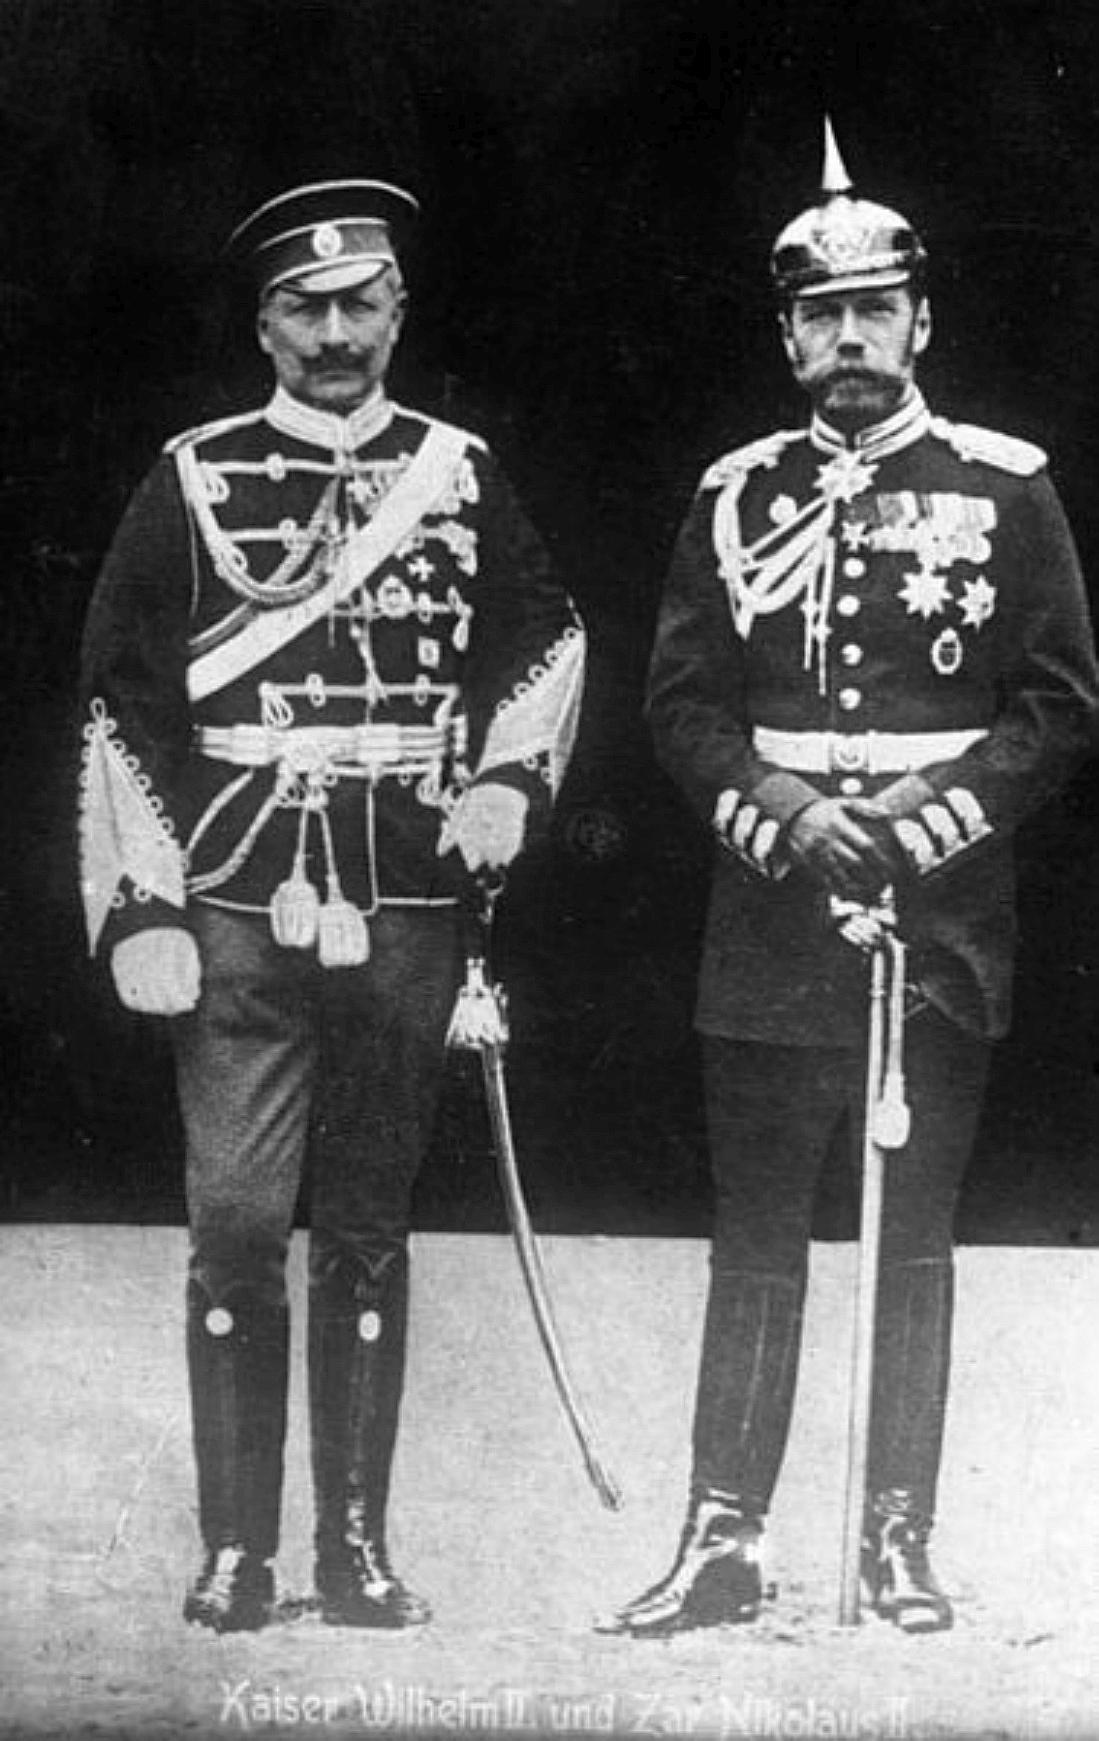 Wilhelm II and Nicholas II